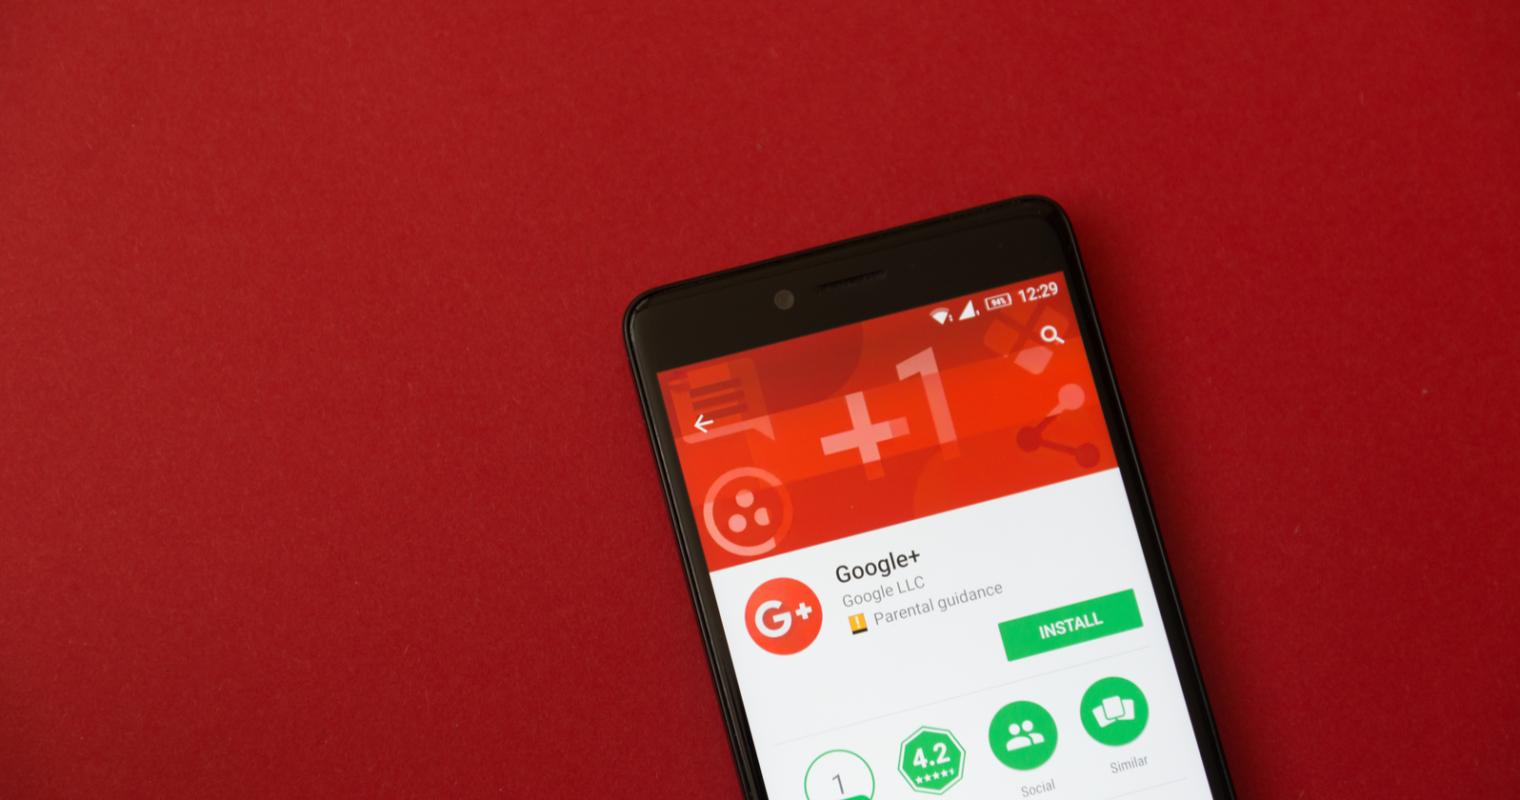 In Memoriam: The Rise, Fall & Death of Google Plus